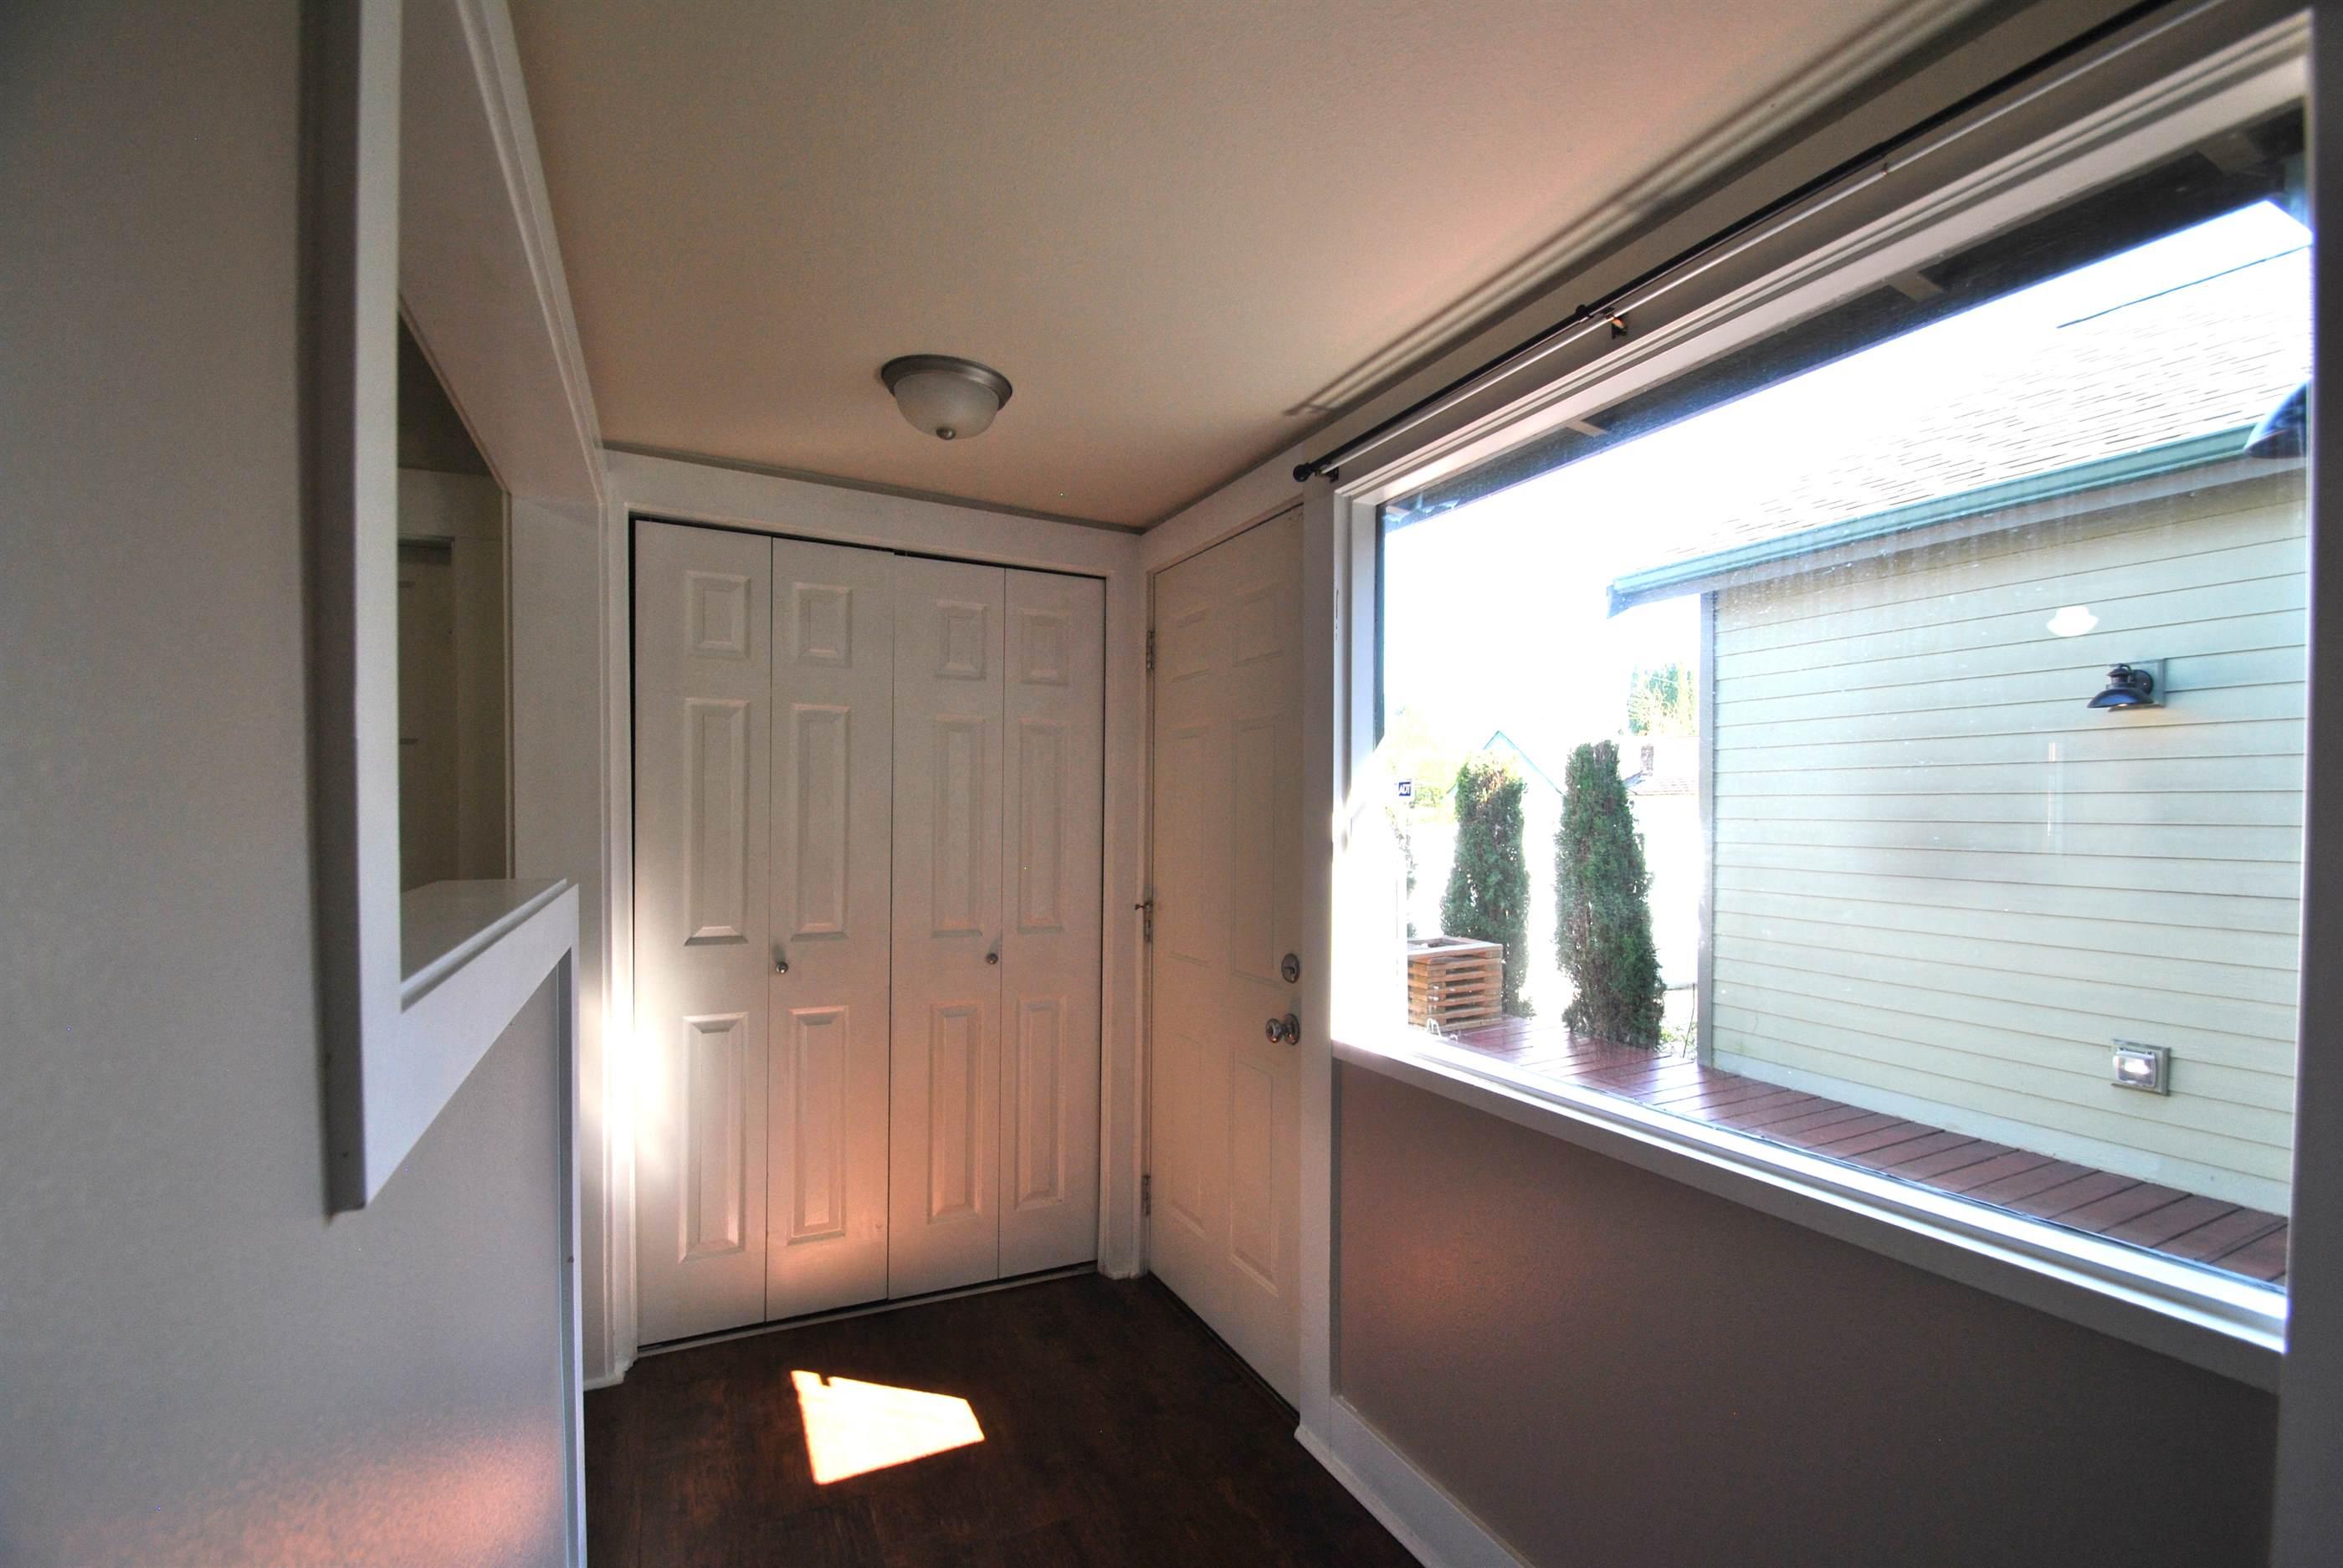 325 Bennett Street, Sedro Woolley, WA 98284